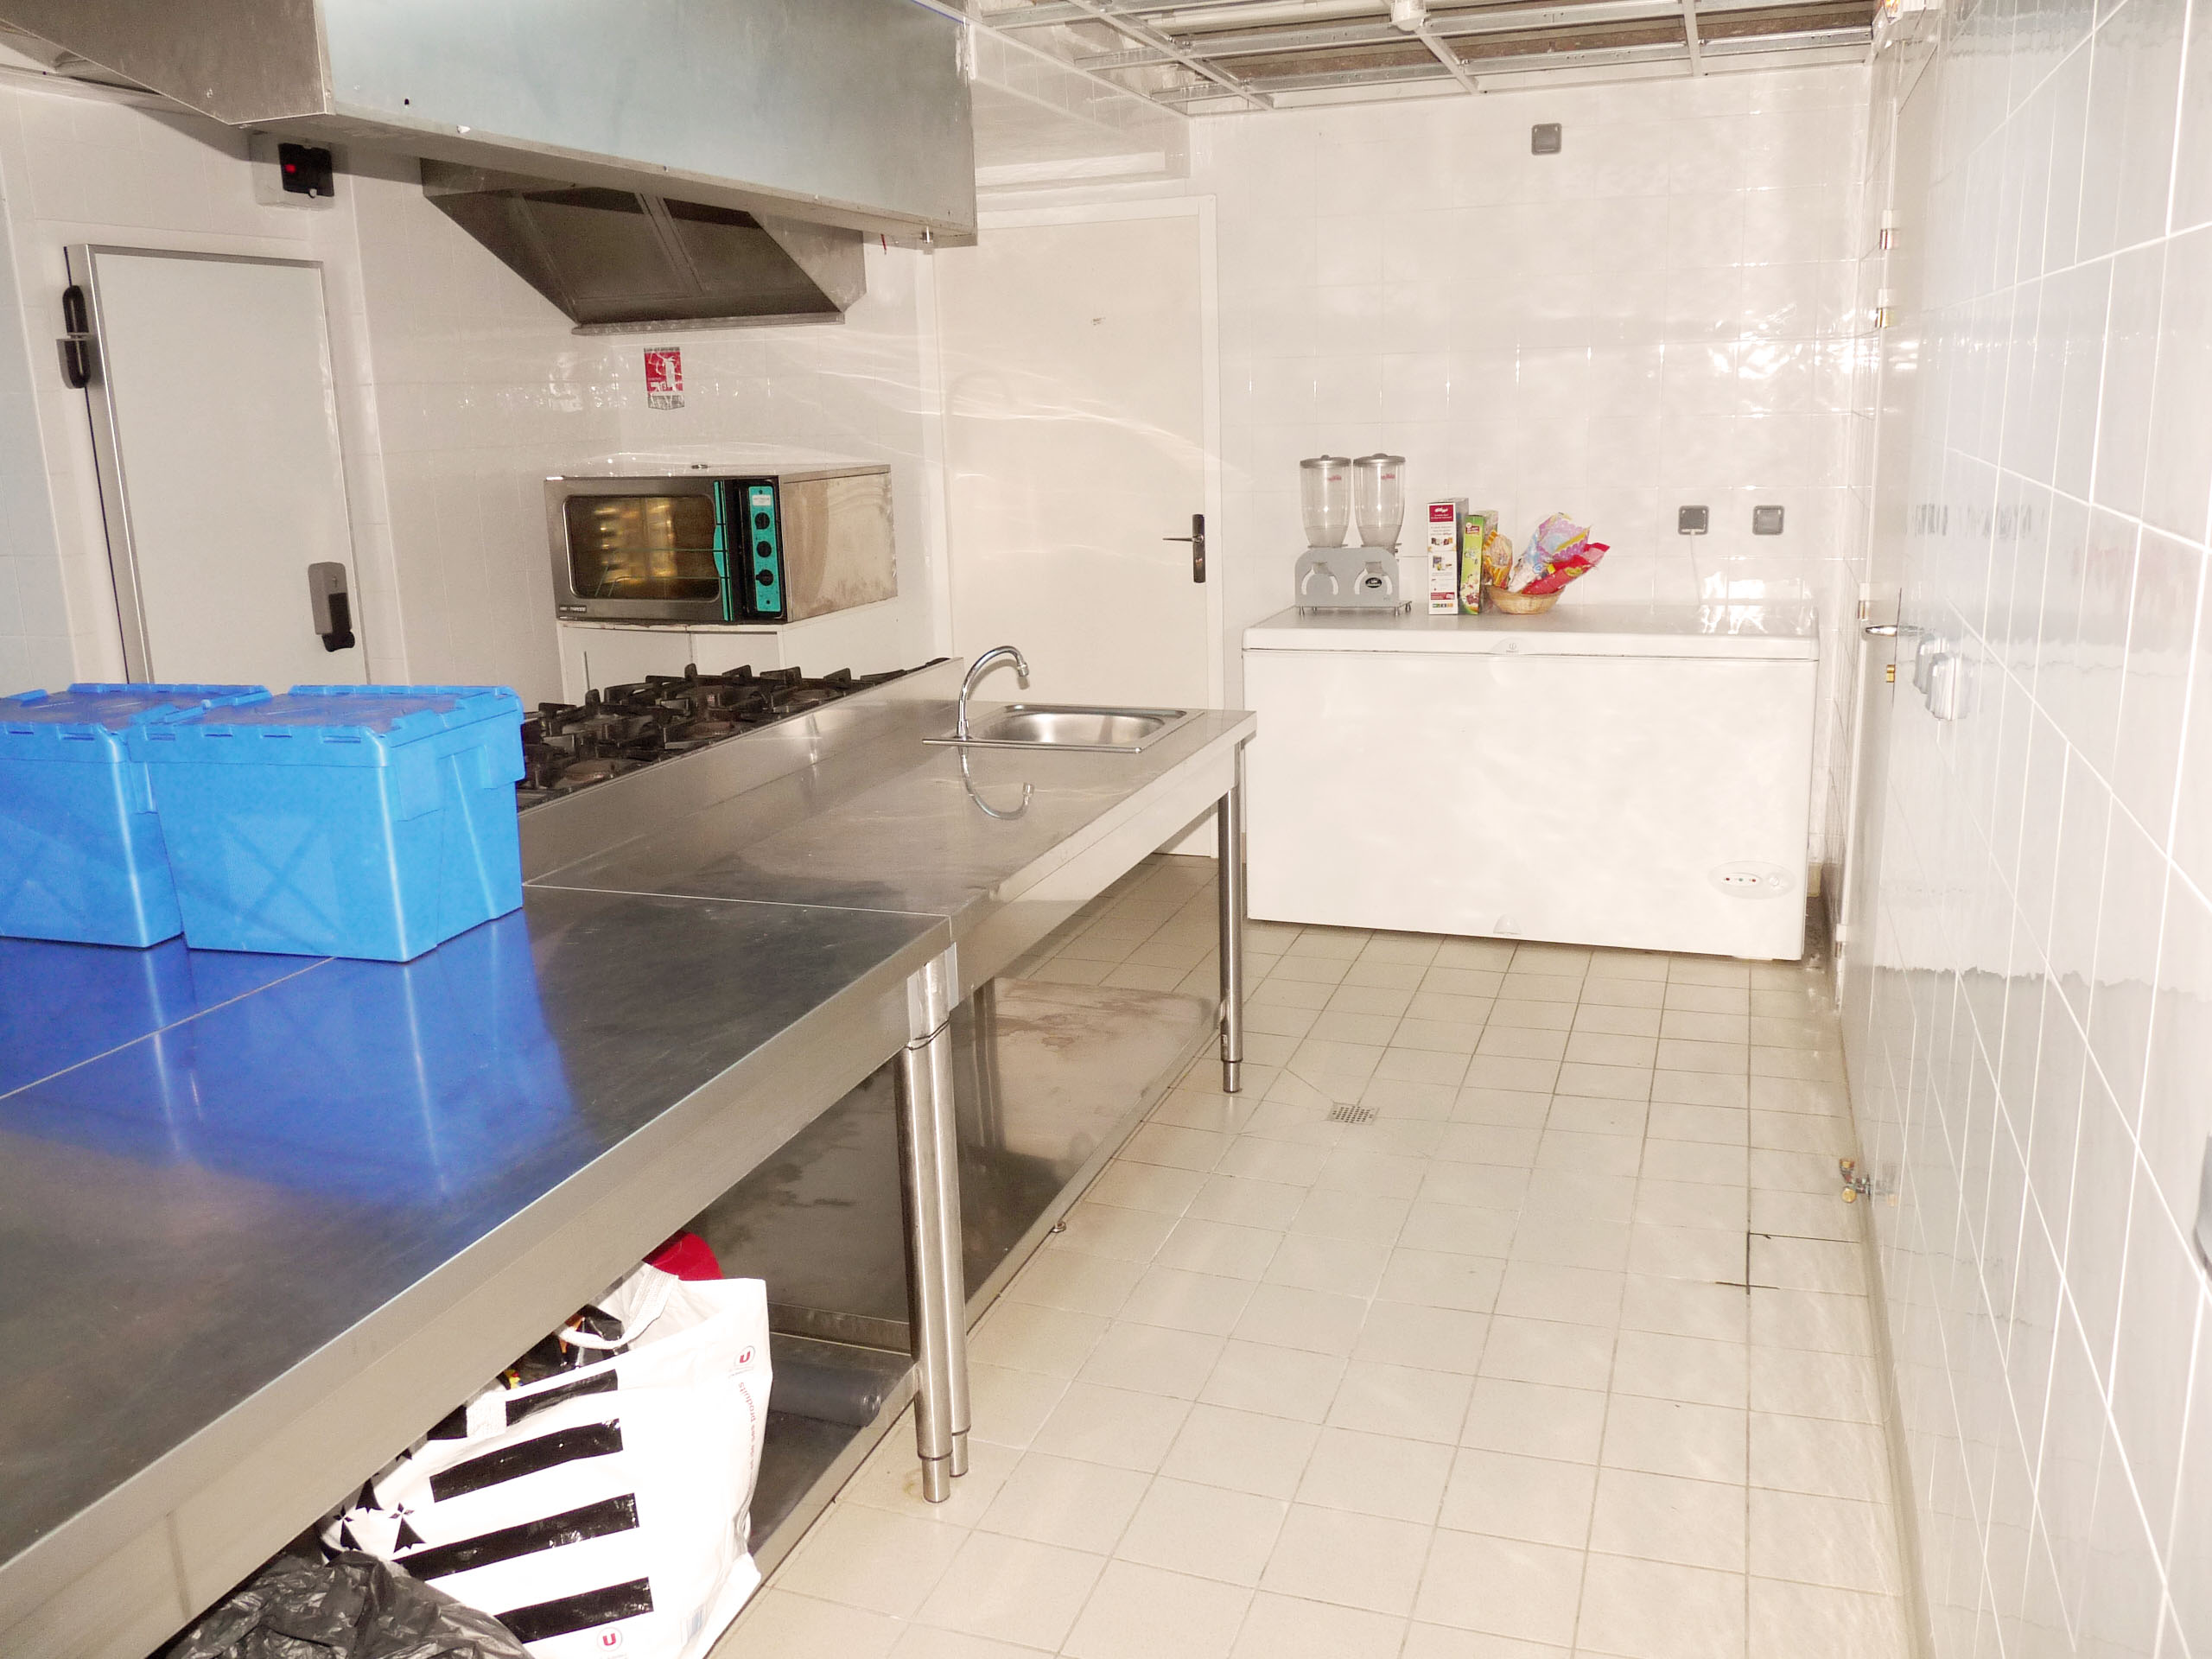 cuisines salles de reception-1